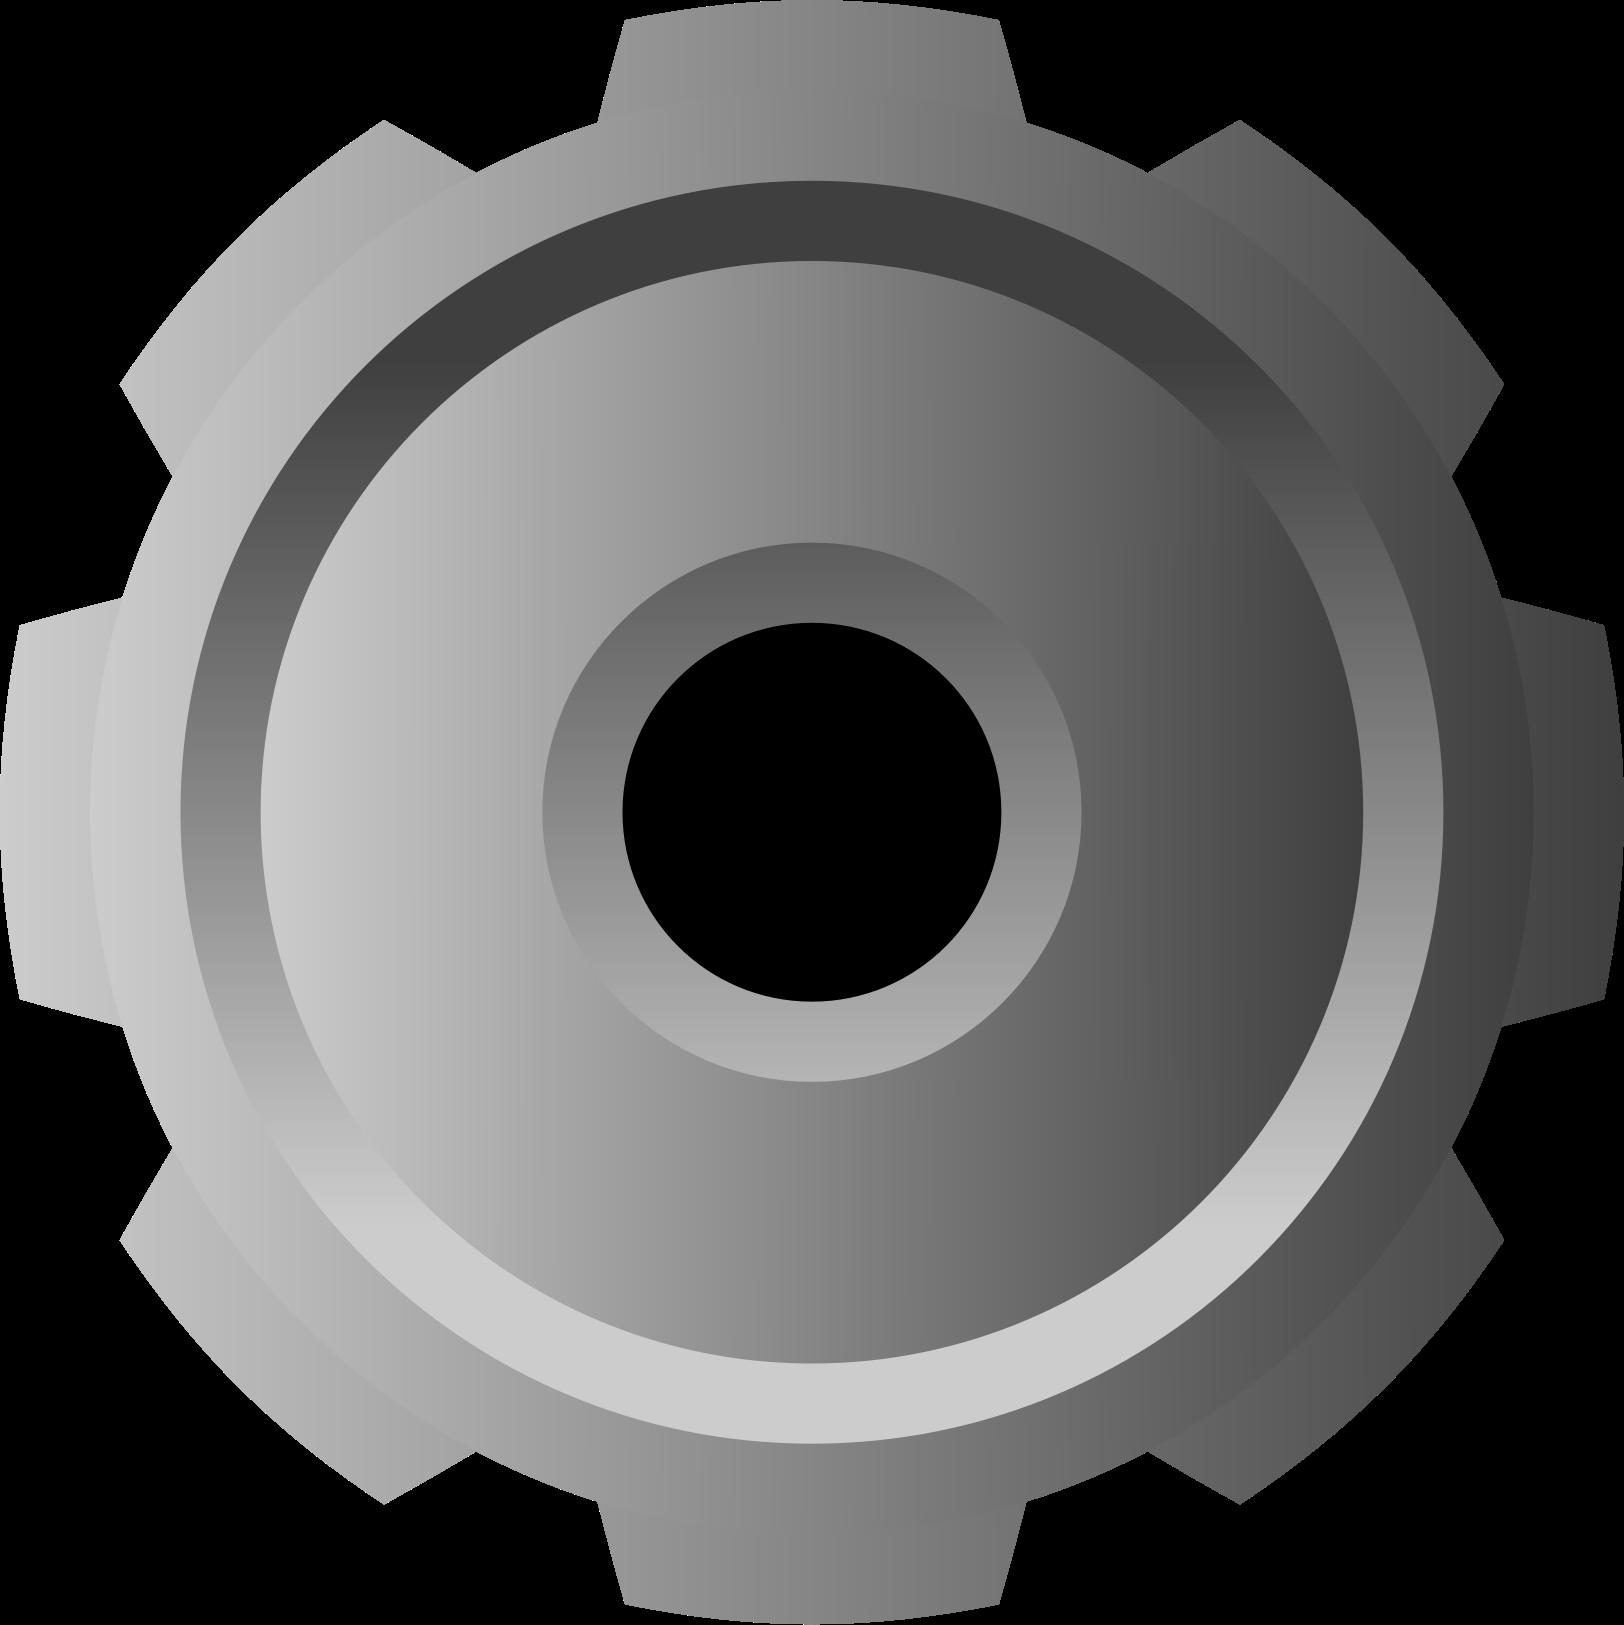 Gear clipart machine gear. Raseone big image png